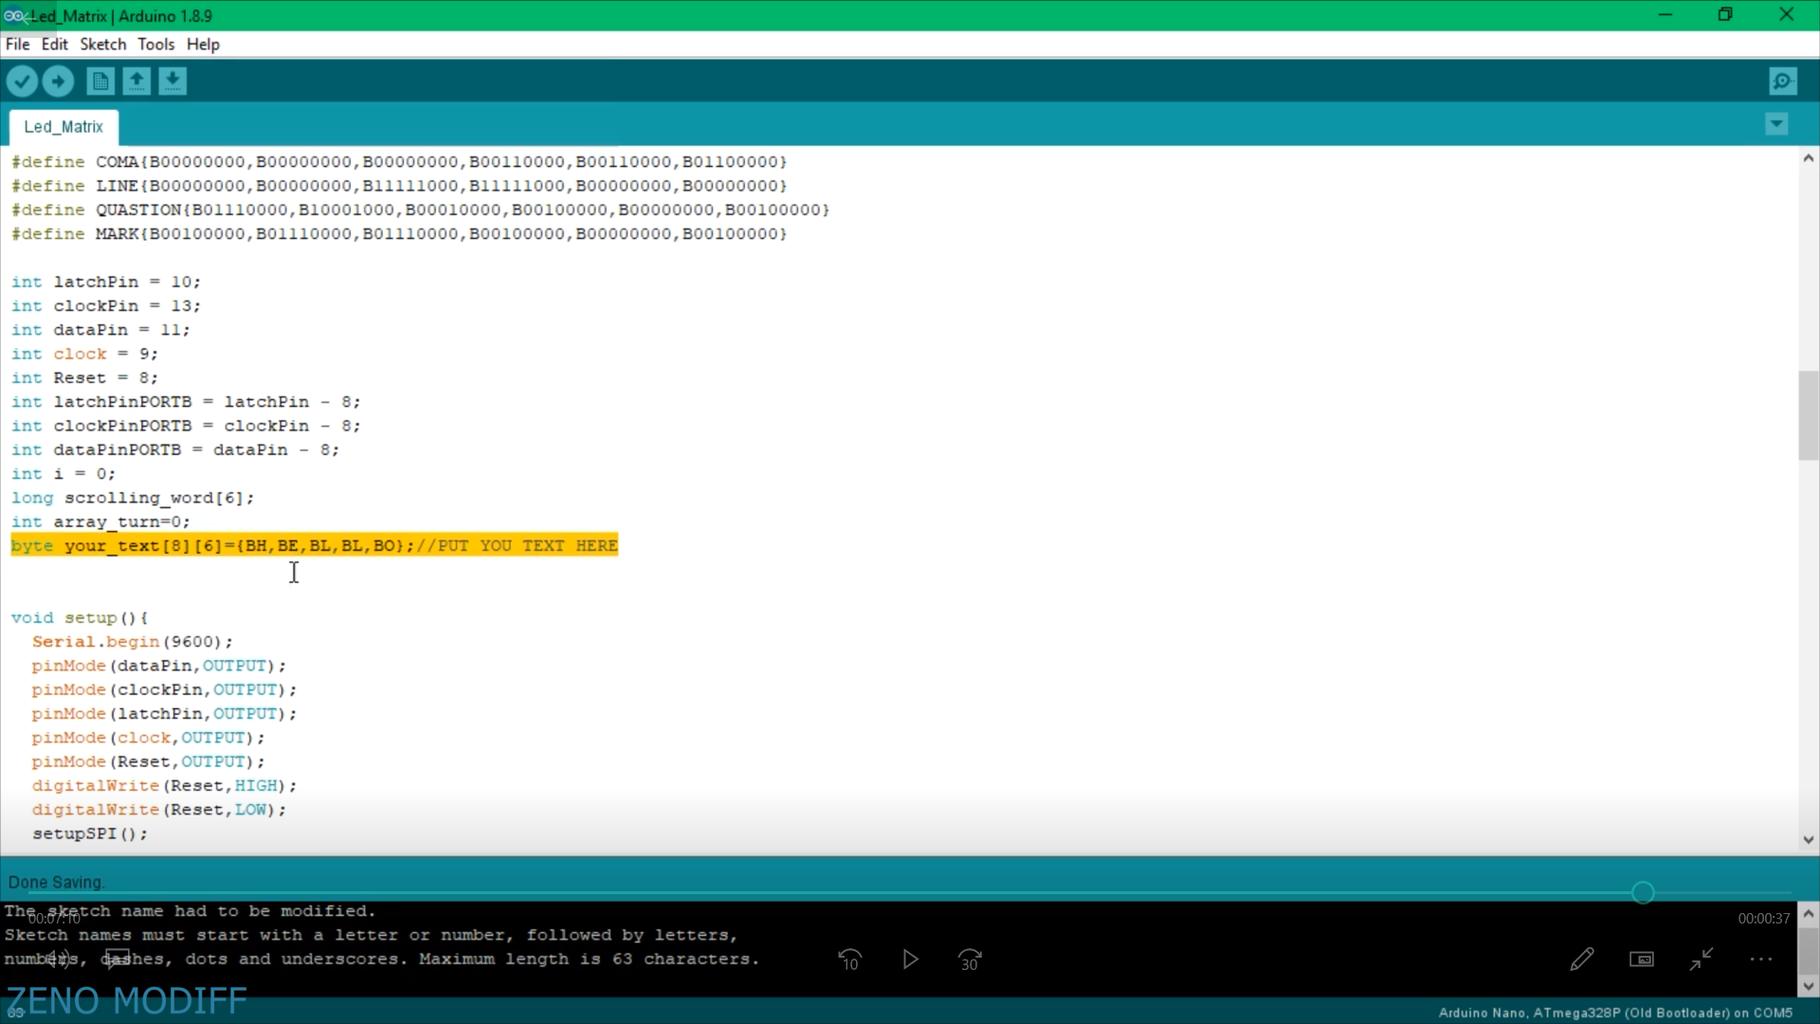 Uploading Arduino Code & Testing